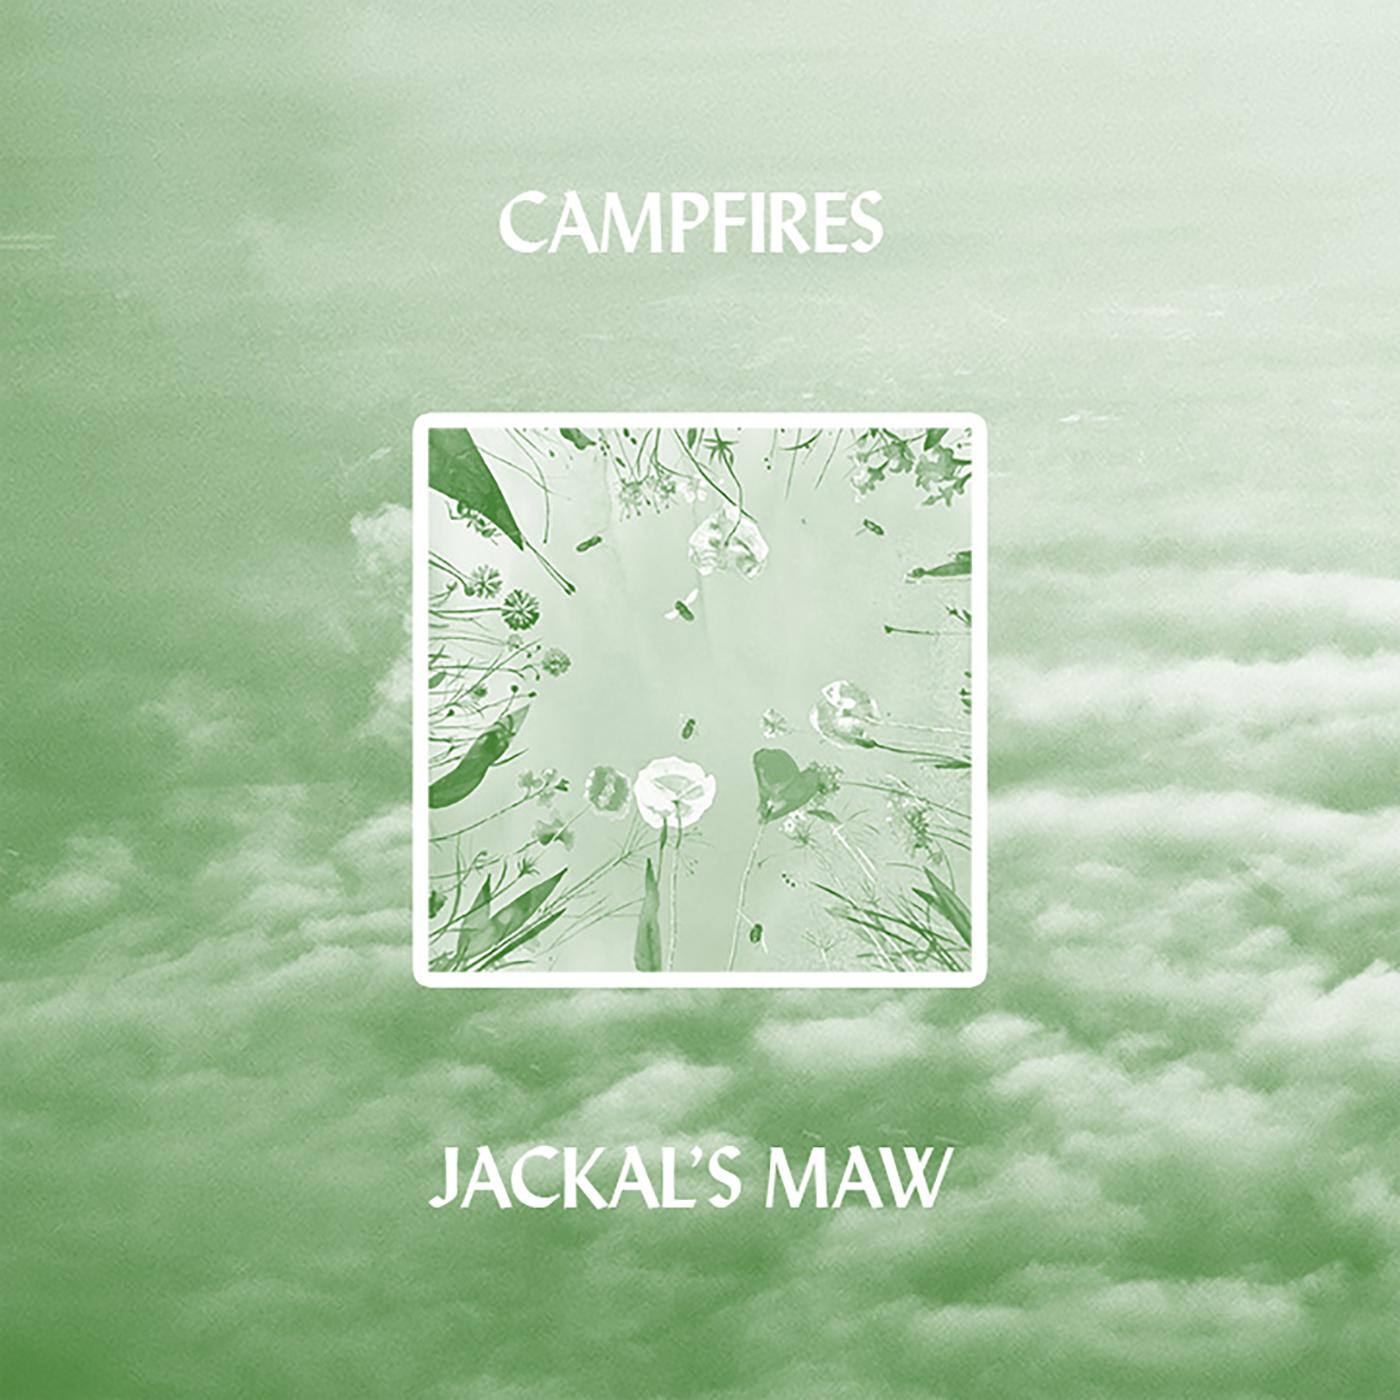 Campfires_JackalsMaw_CoverArt.jpg